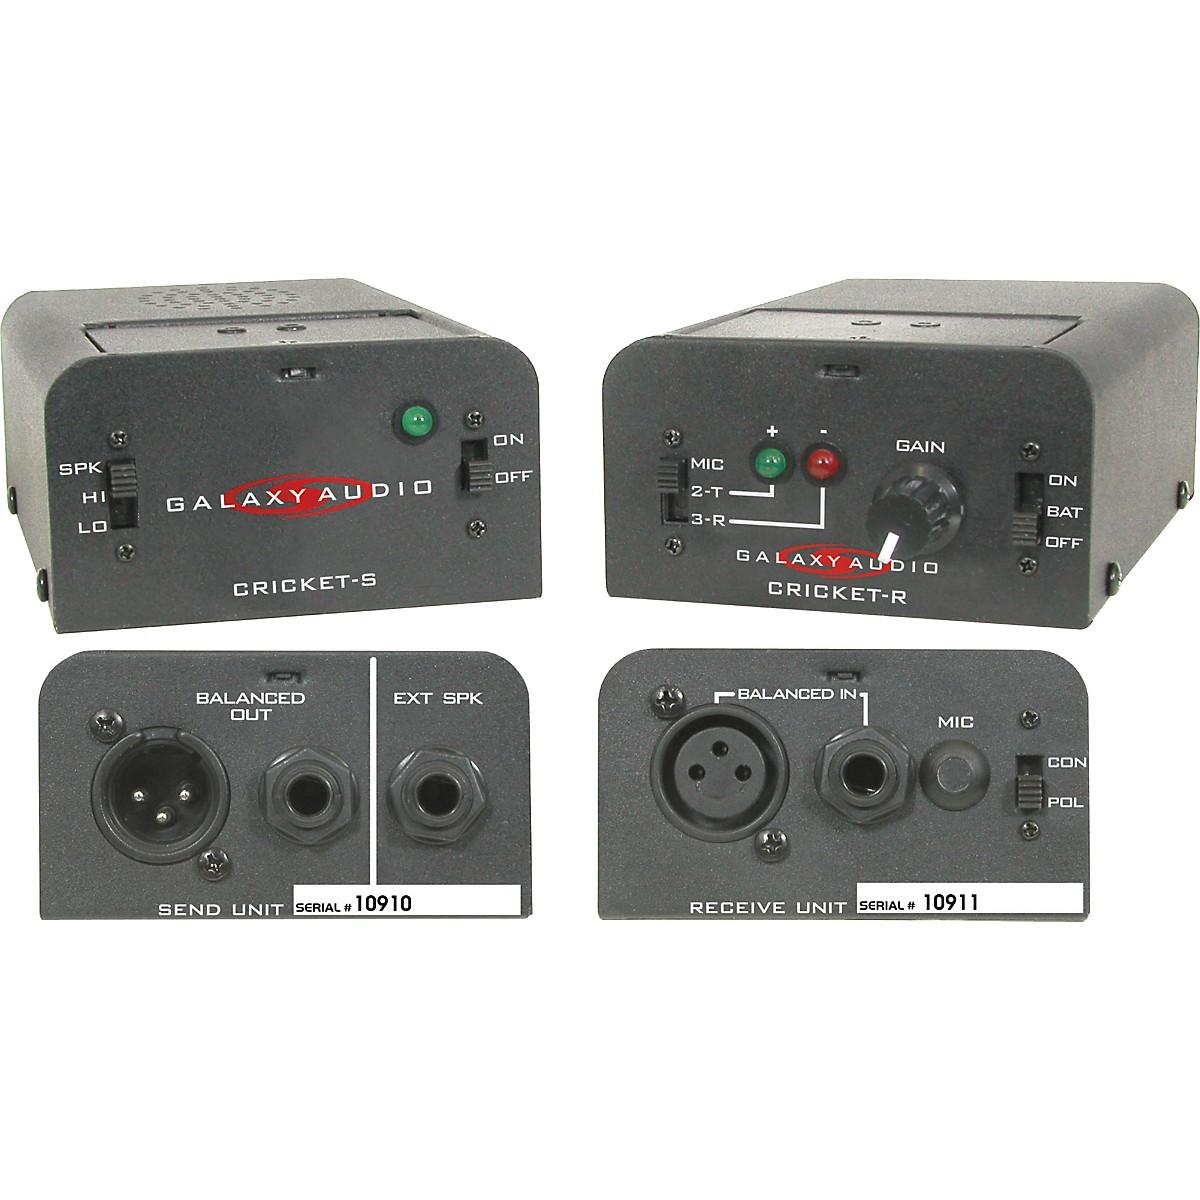 Galaxy Audio CPTS0000 Cricket Polarity Test Set